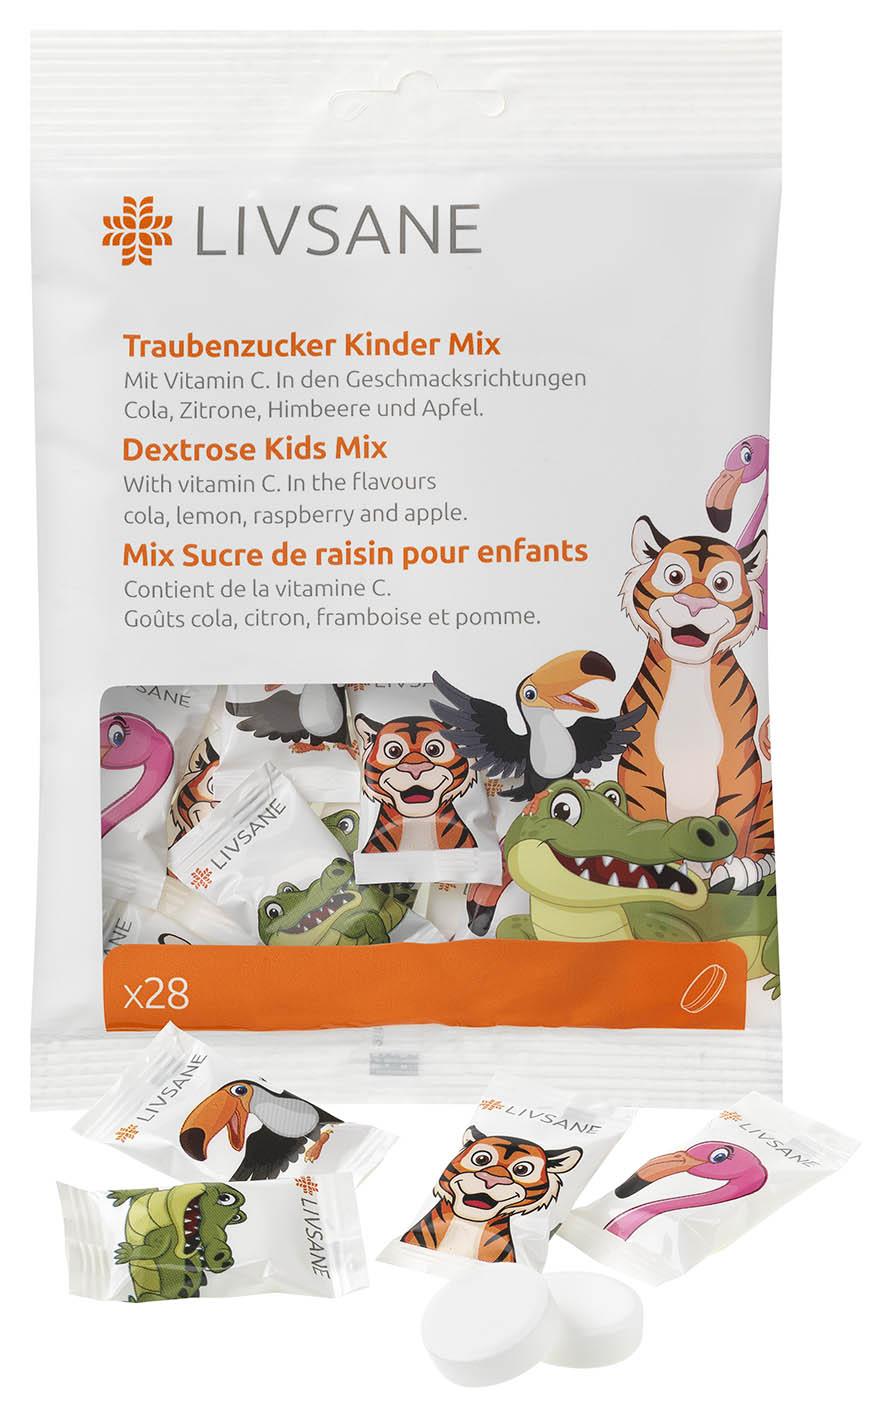 LIVSANE Dextróza pre deti Mix žuvacie tablety s vitamínom C 1x28 ks